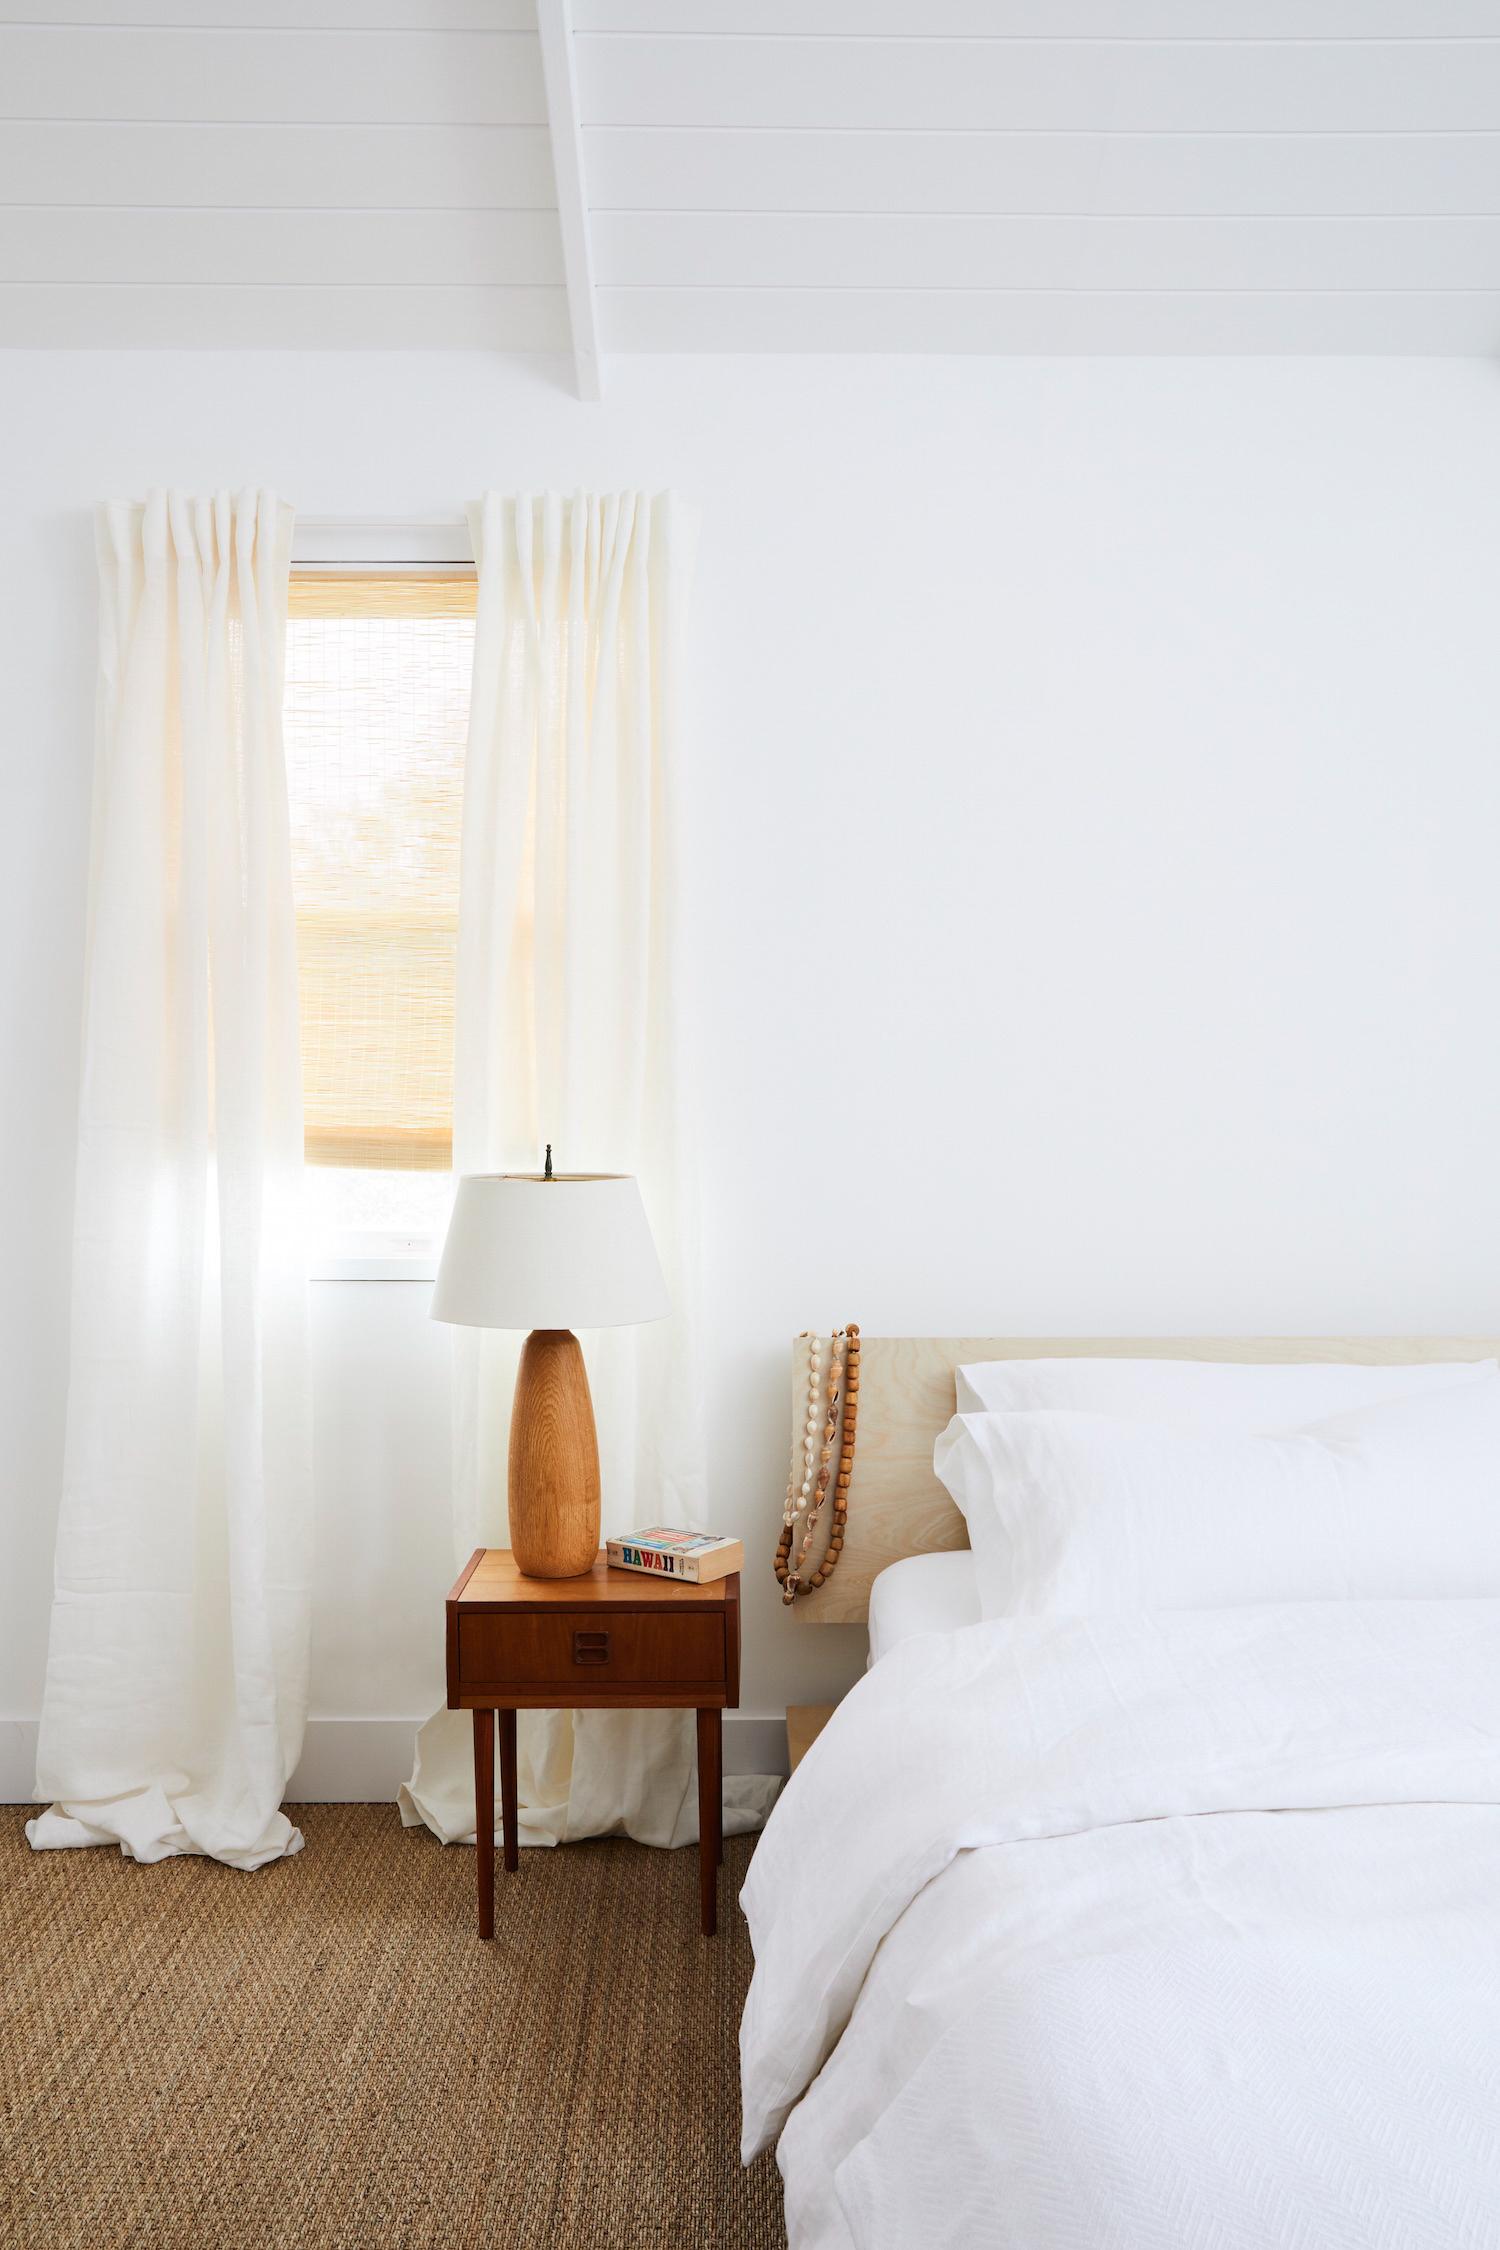 CORRECTED McKinely_Bungalow_Bedrooms_004.jpg